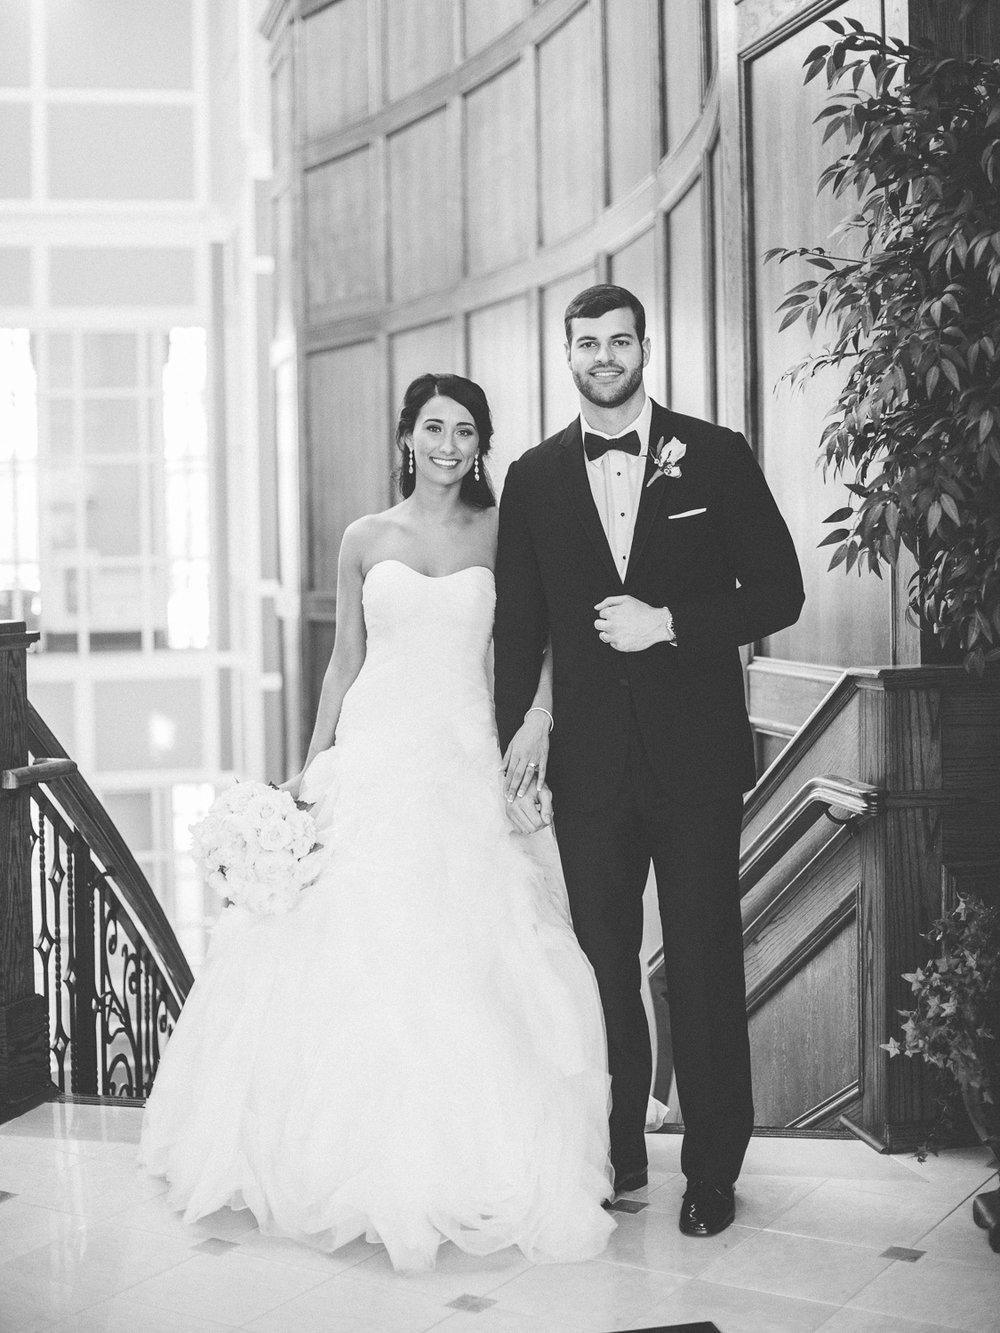 alexgreg-wedding-bridegroomdancing-christinadavisphoto31.jpg